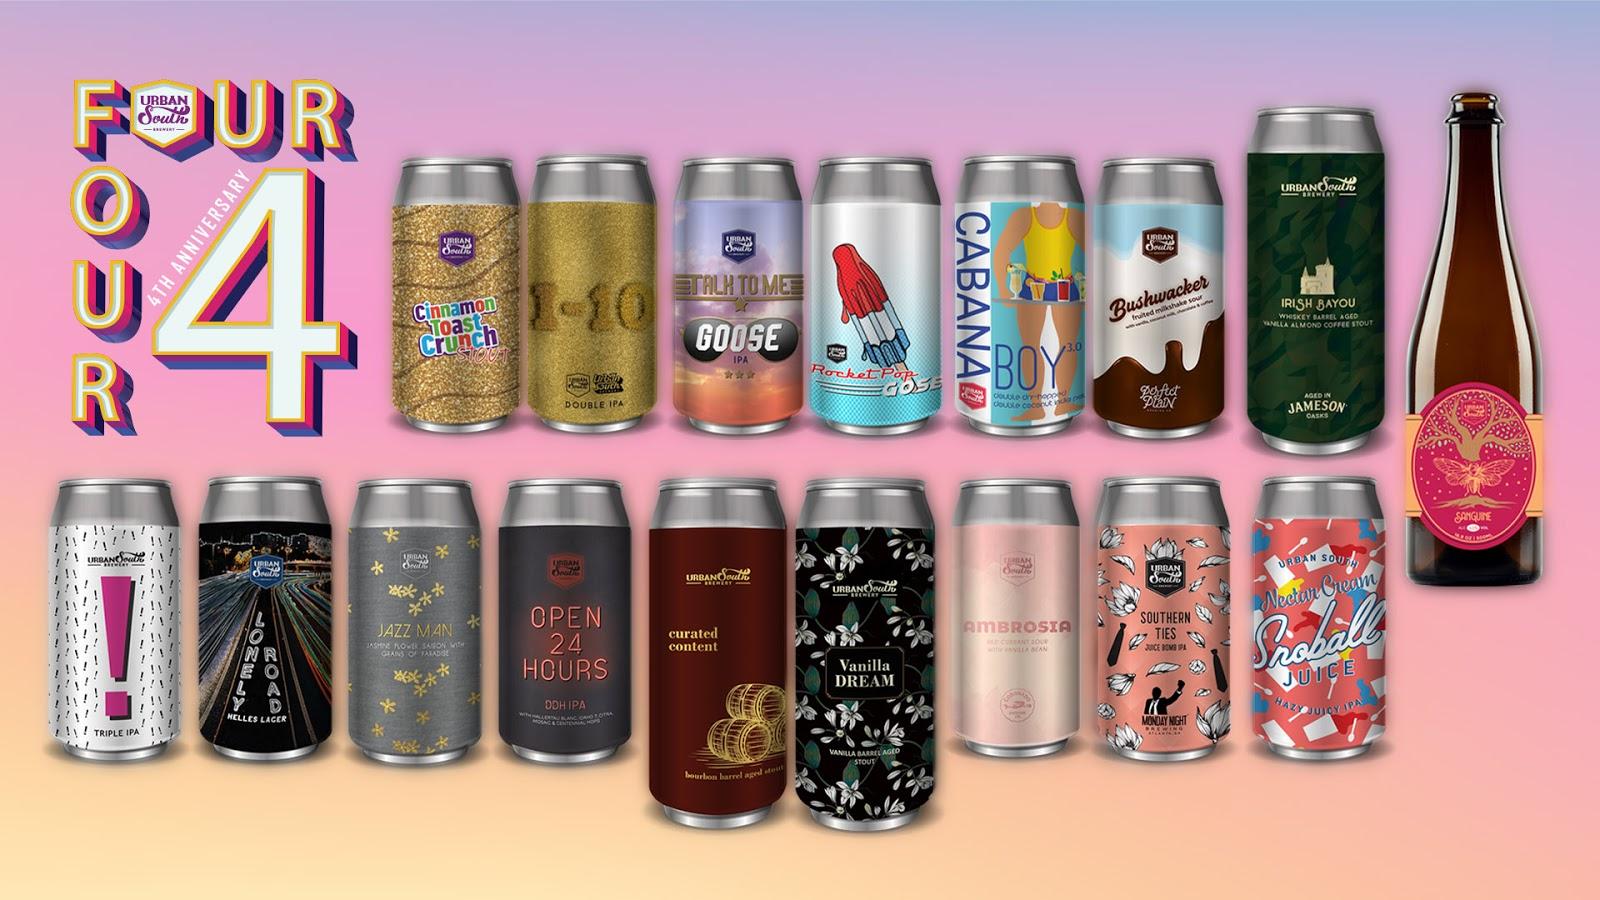 Urban South Brewery发行17周年纪念啤酒